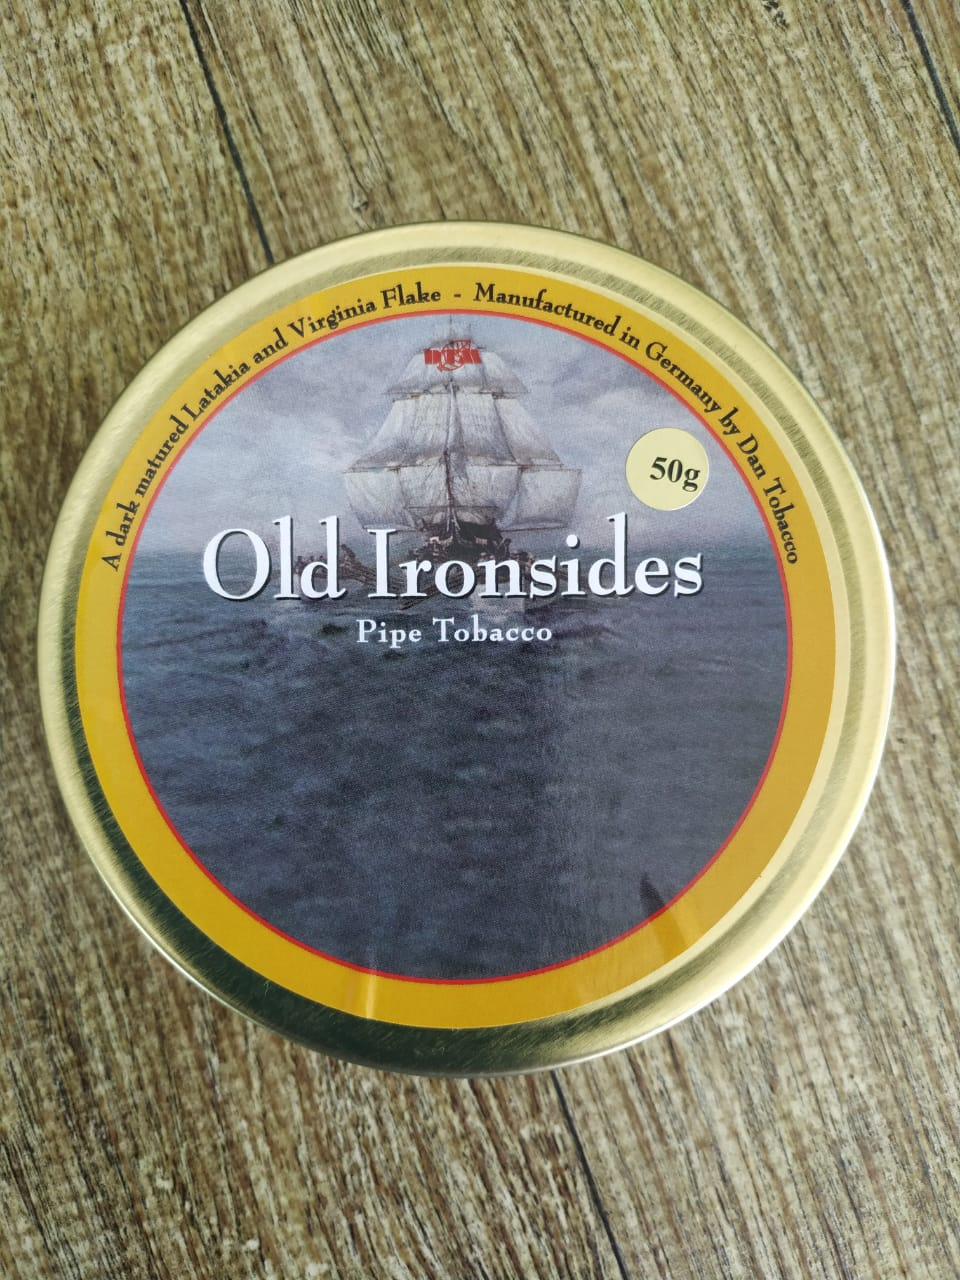 Dan Tobacco - Old Ironsides